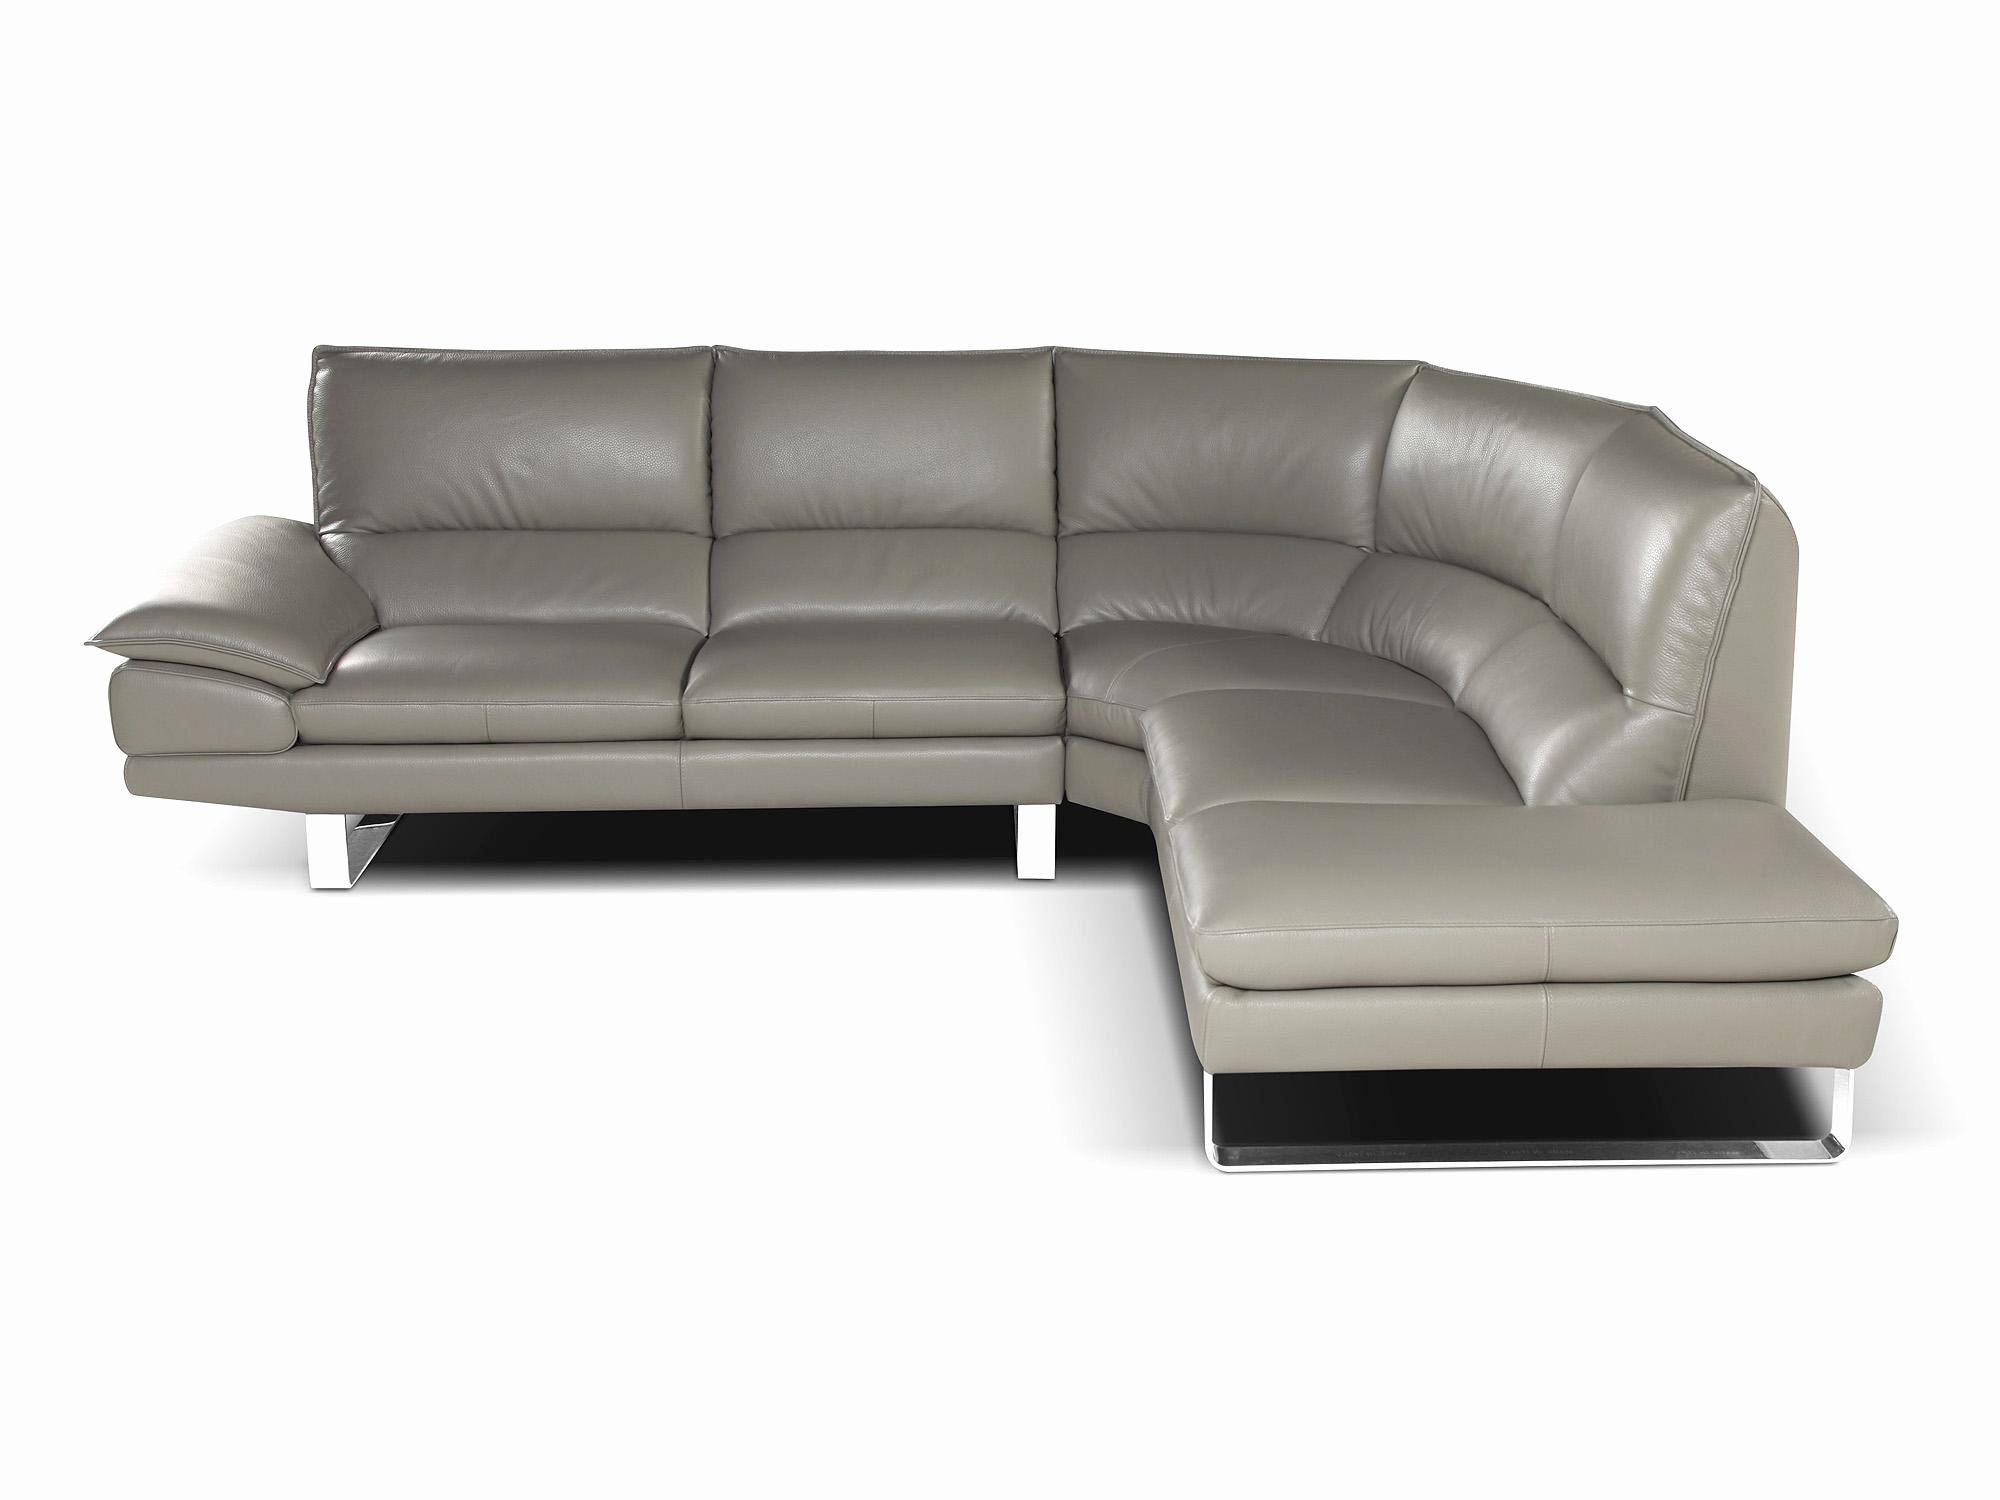 New Nicoletti Leather Sofa Graphics Nicoletti Leather Sofa Inspirational  Modern Furniture Contemporary Furniture And Office Furniture